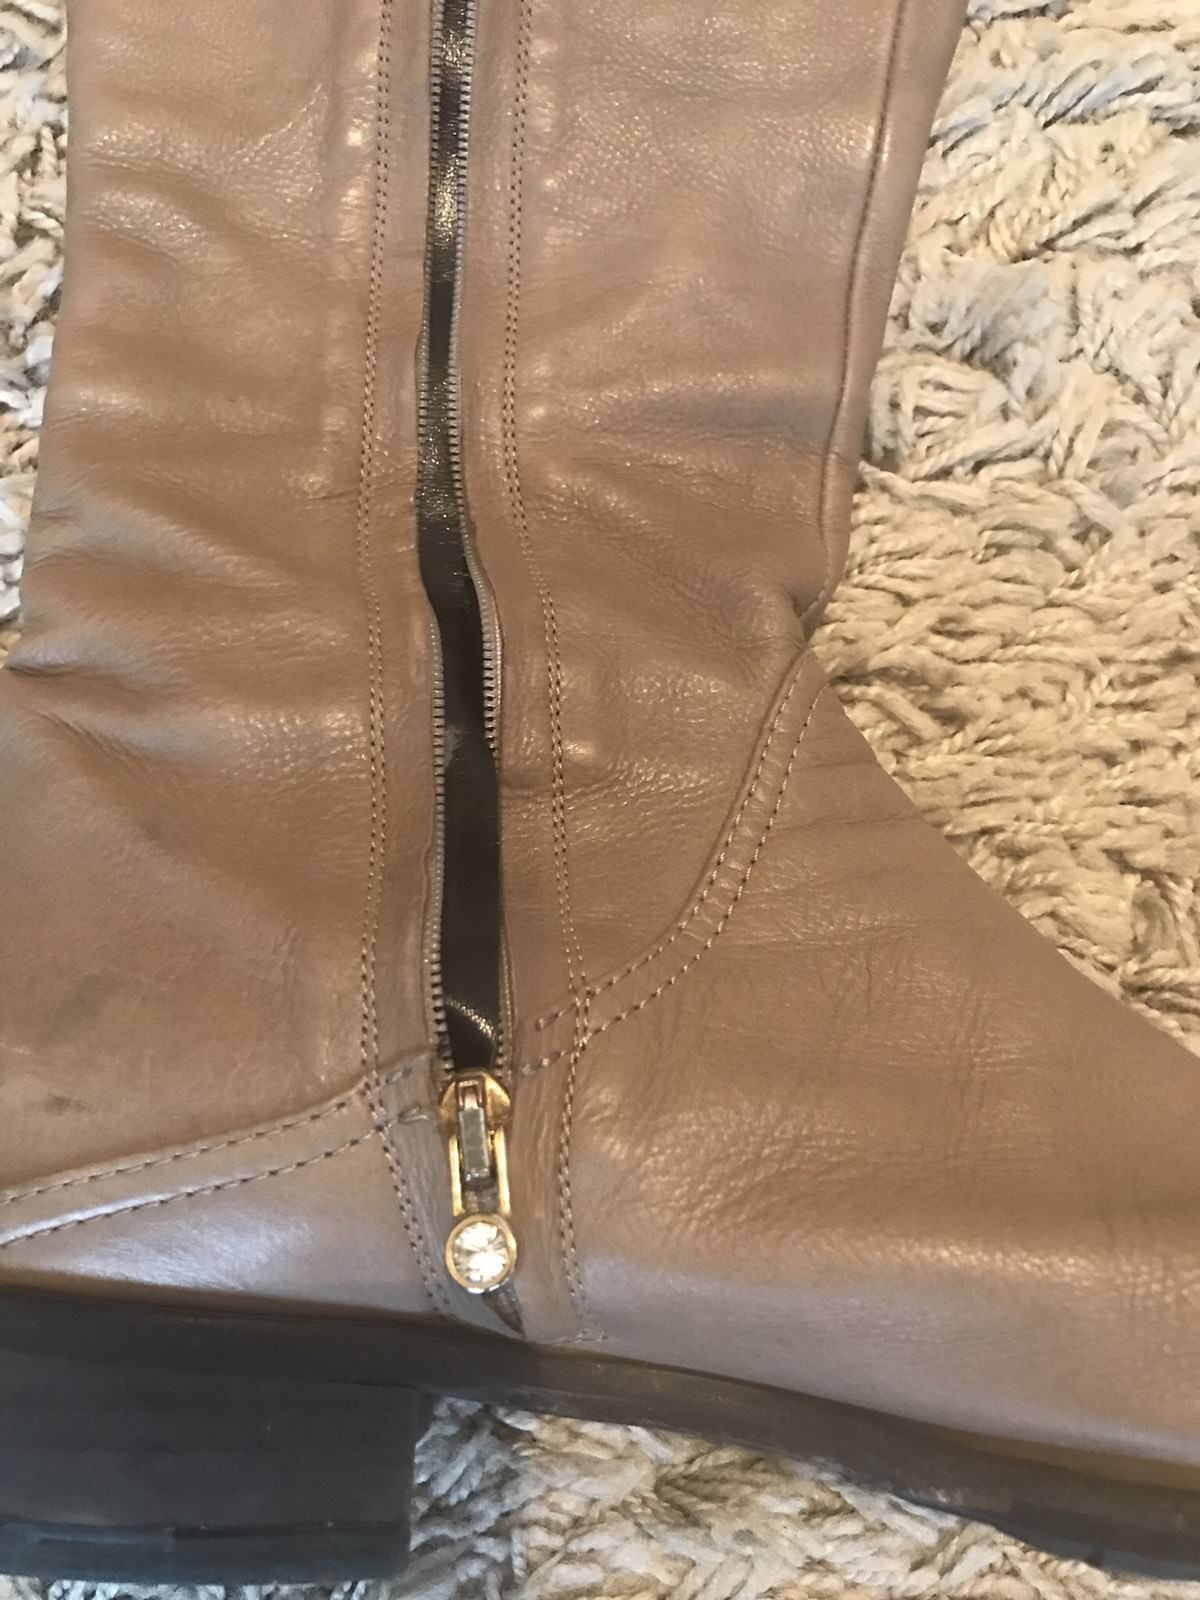 Stiefel Stiefeletten Stiefeletten Stiefeletten Lederschuhe Modell Max Mara 38  | Komfort  c6629e